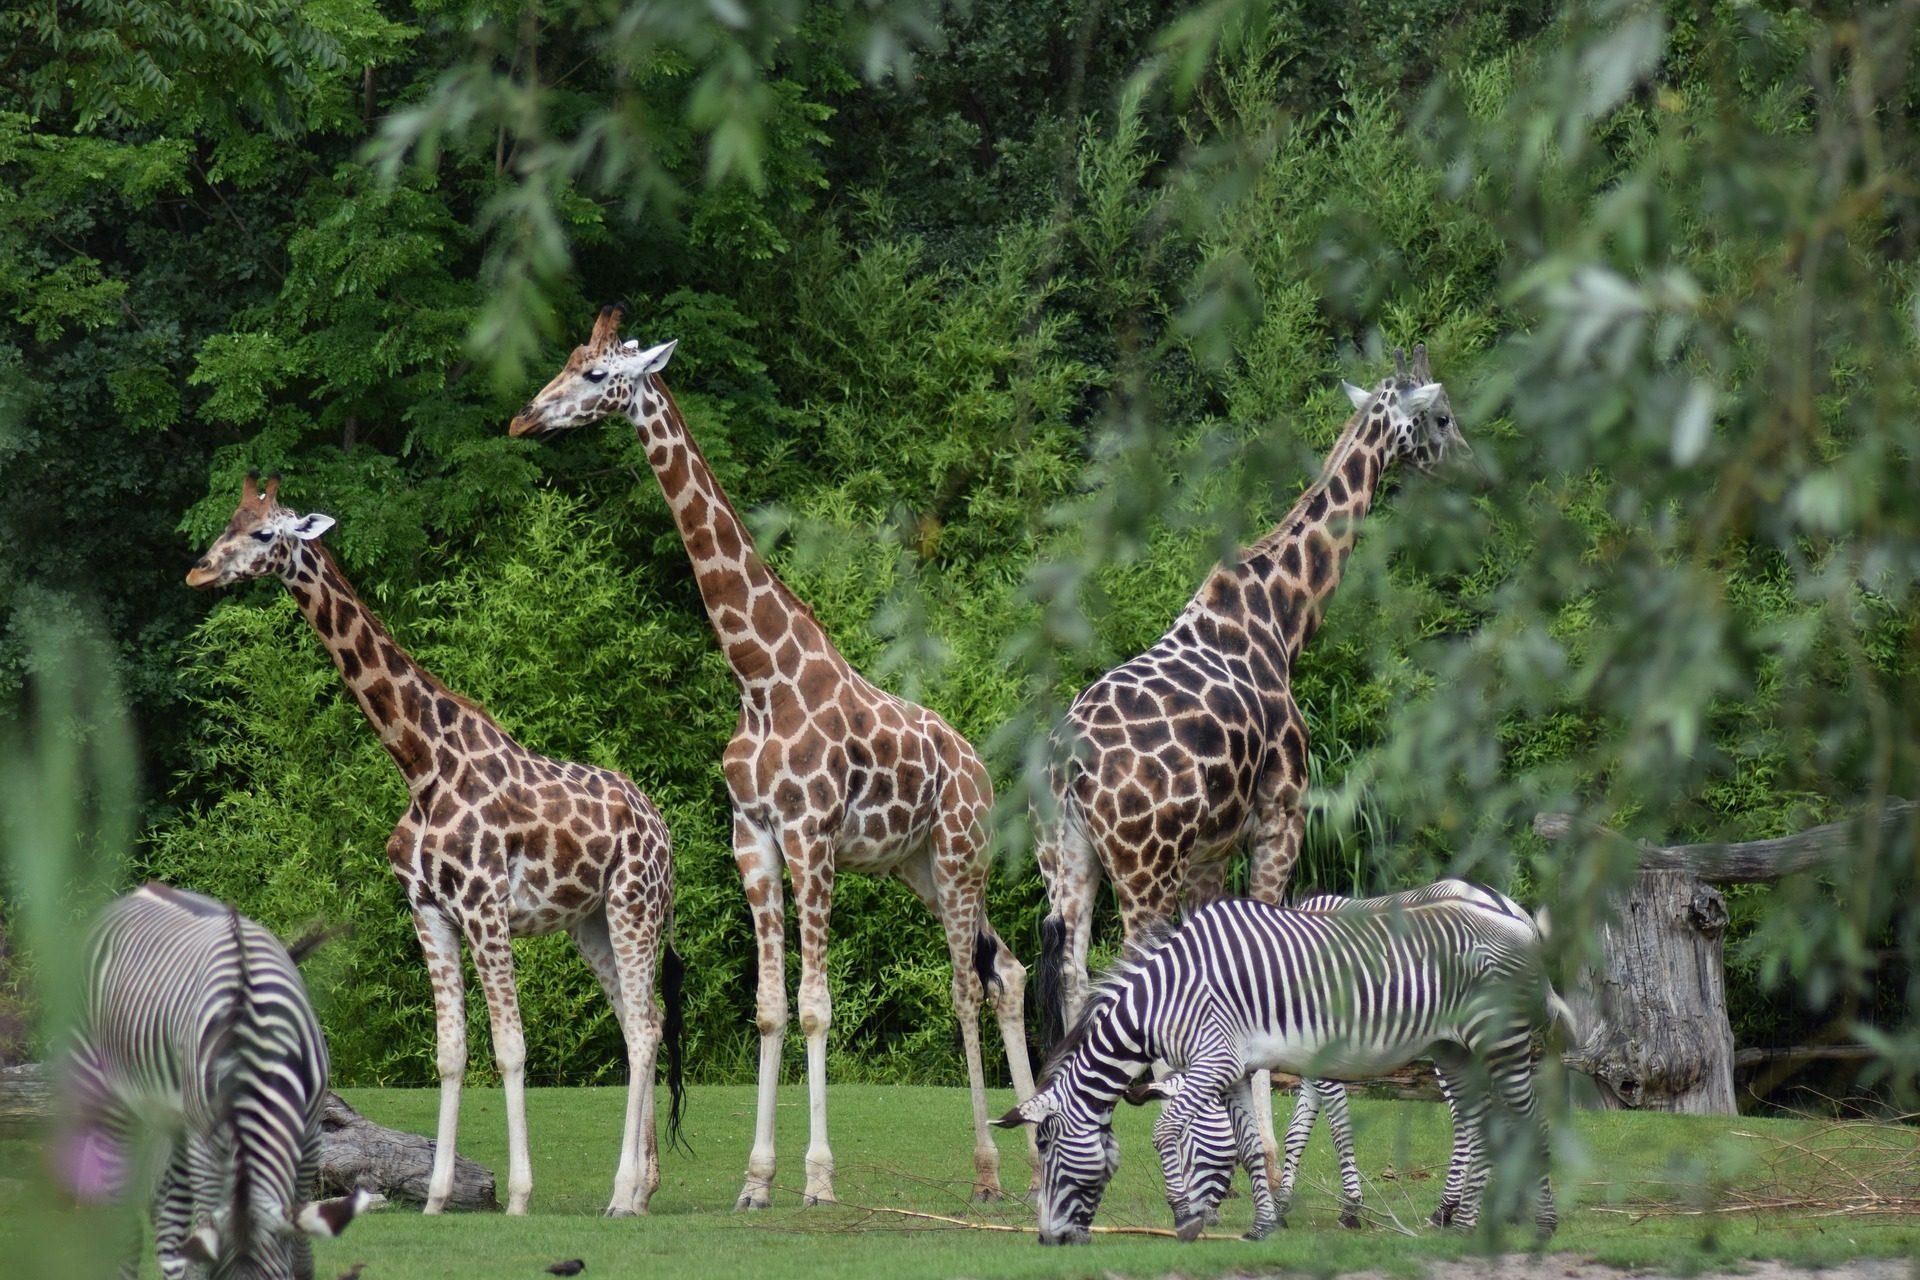 jirafas, cebras, zoo, reserva, árboles - Fondos de Pantalla HD - professor-falken.com